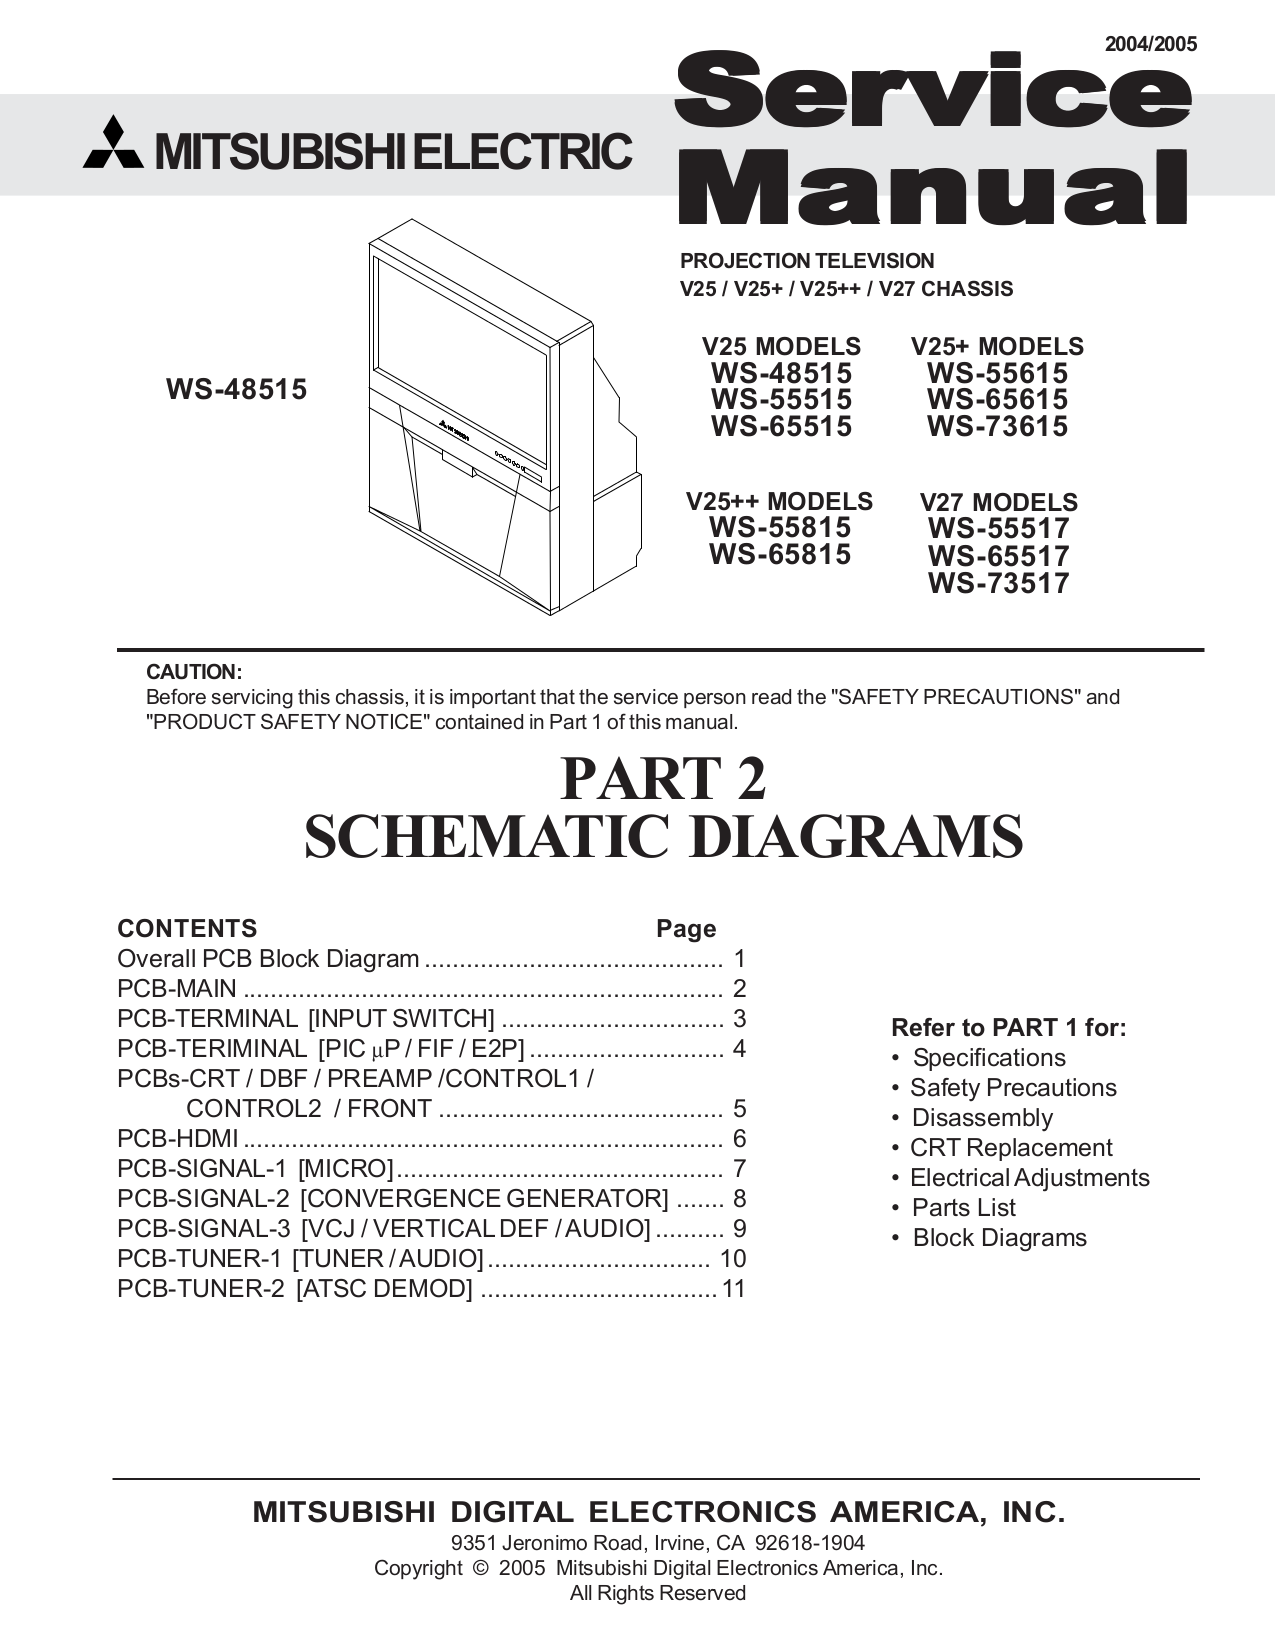 Download Free Pdf For Mitsubishi Ws 65517 Tv Manual Schematic Dlp